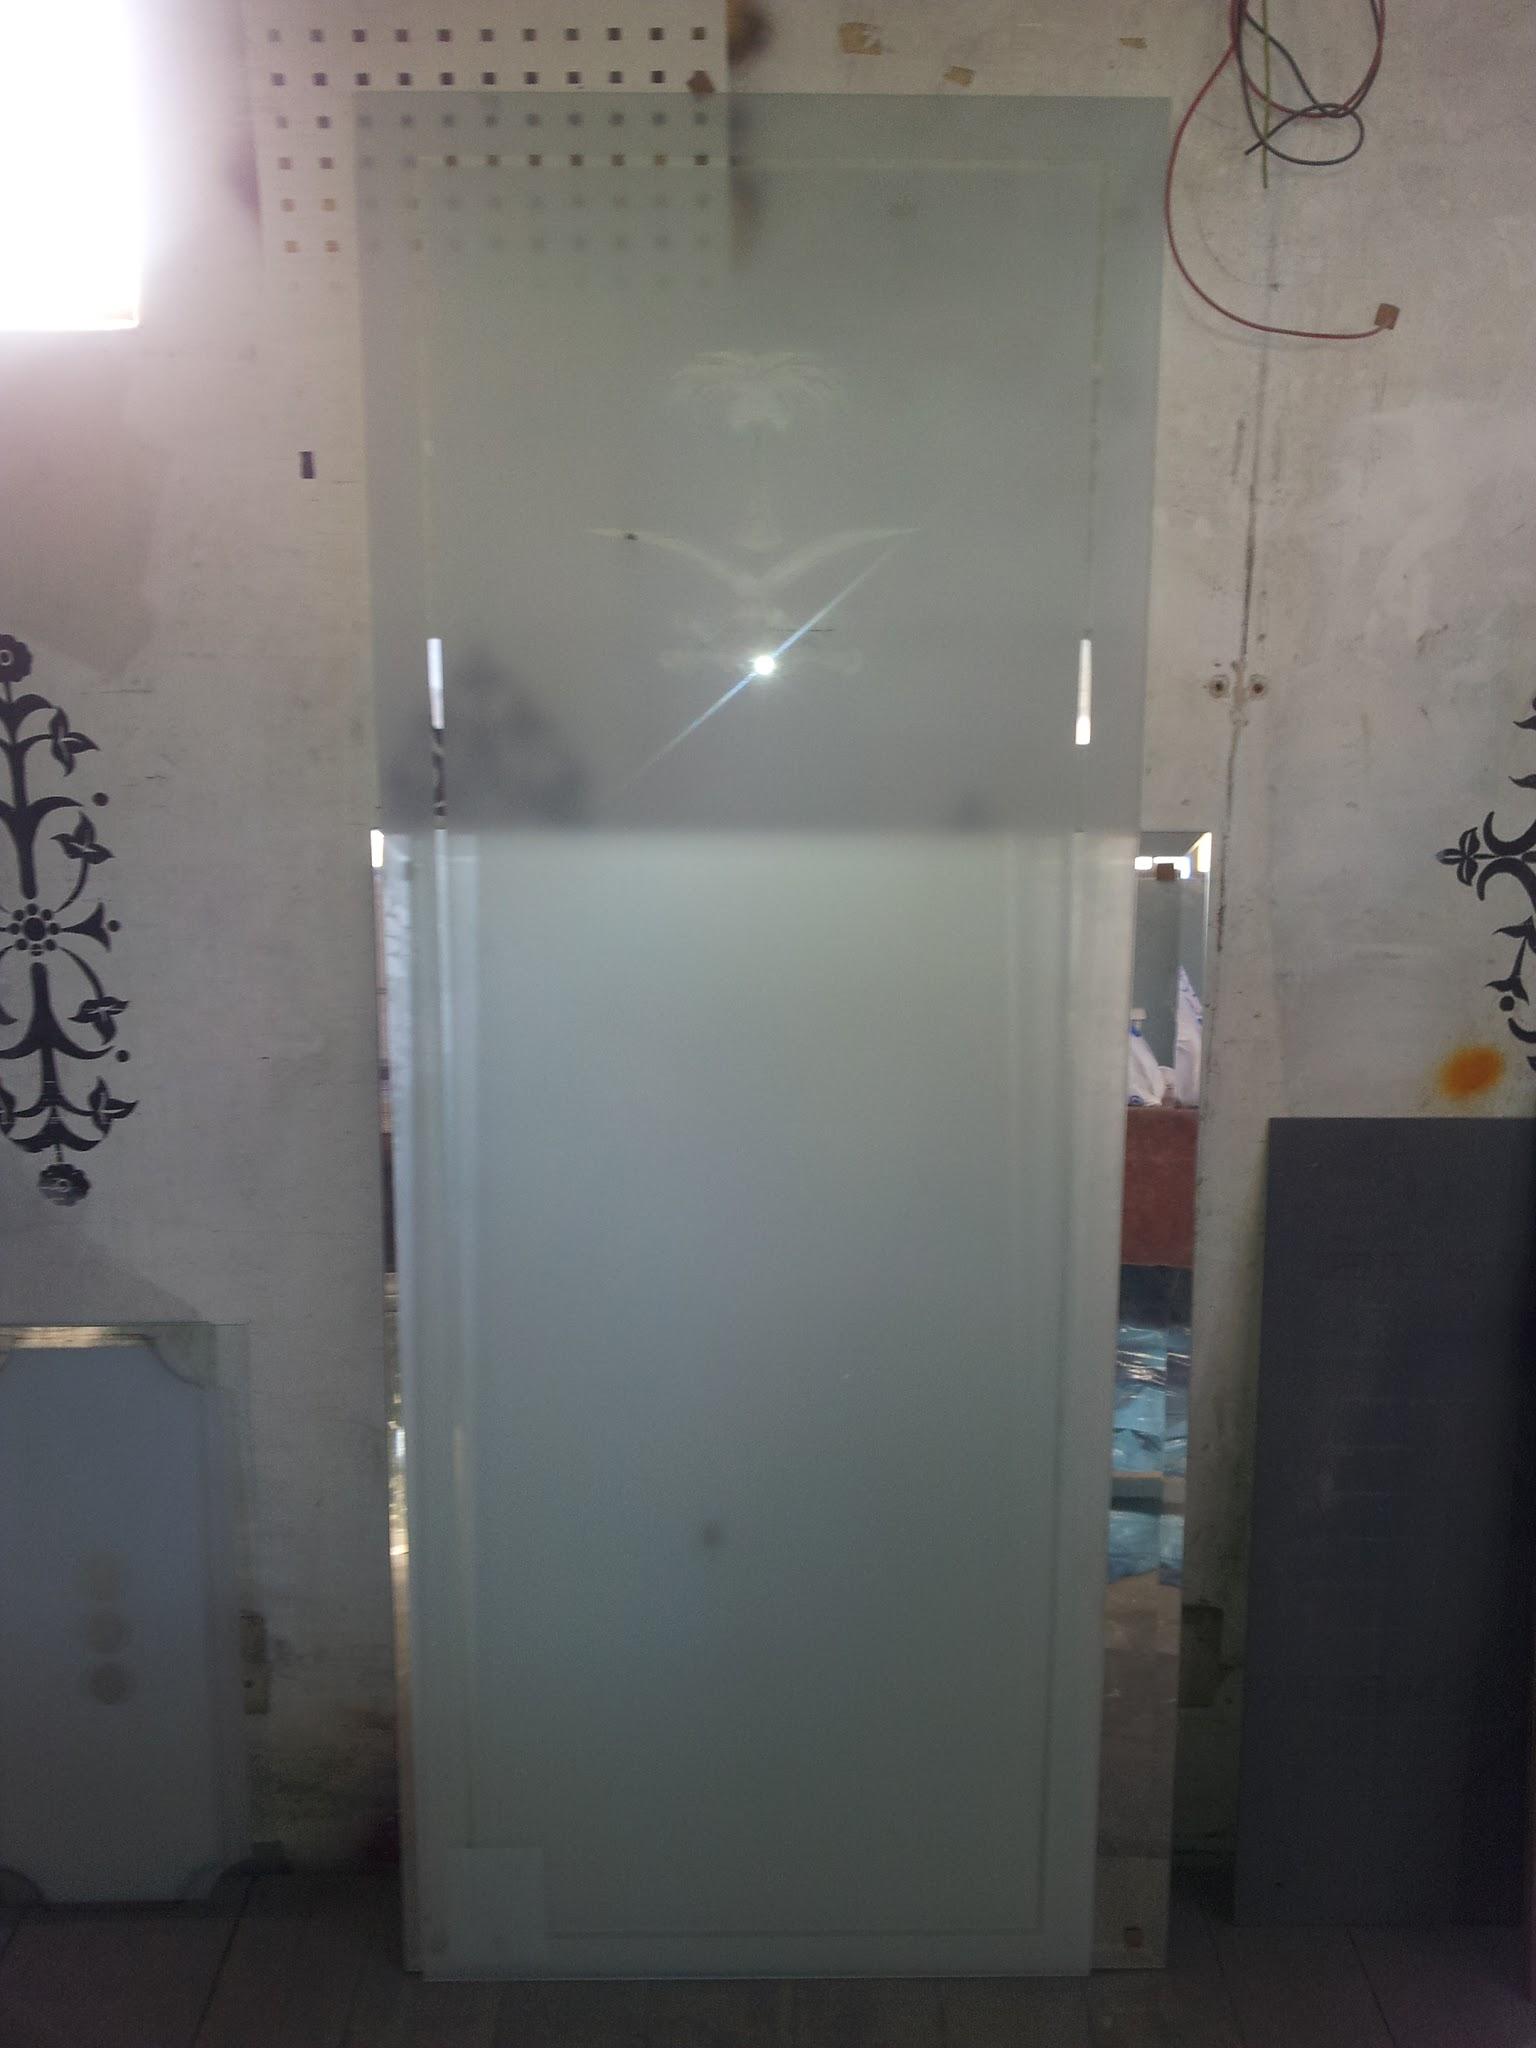 20121113_084805